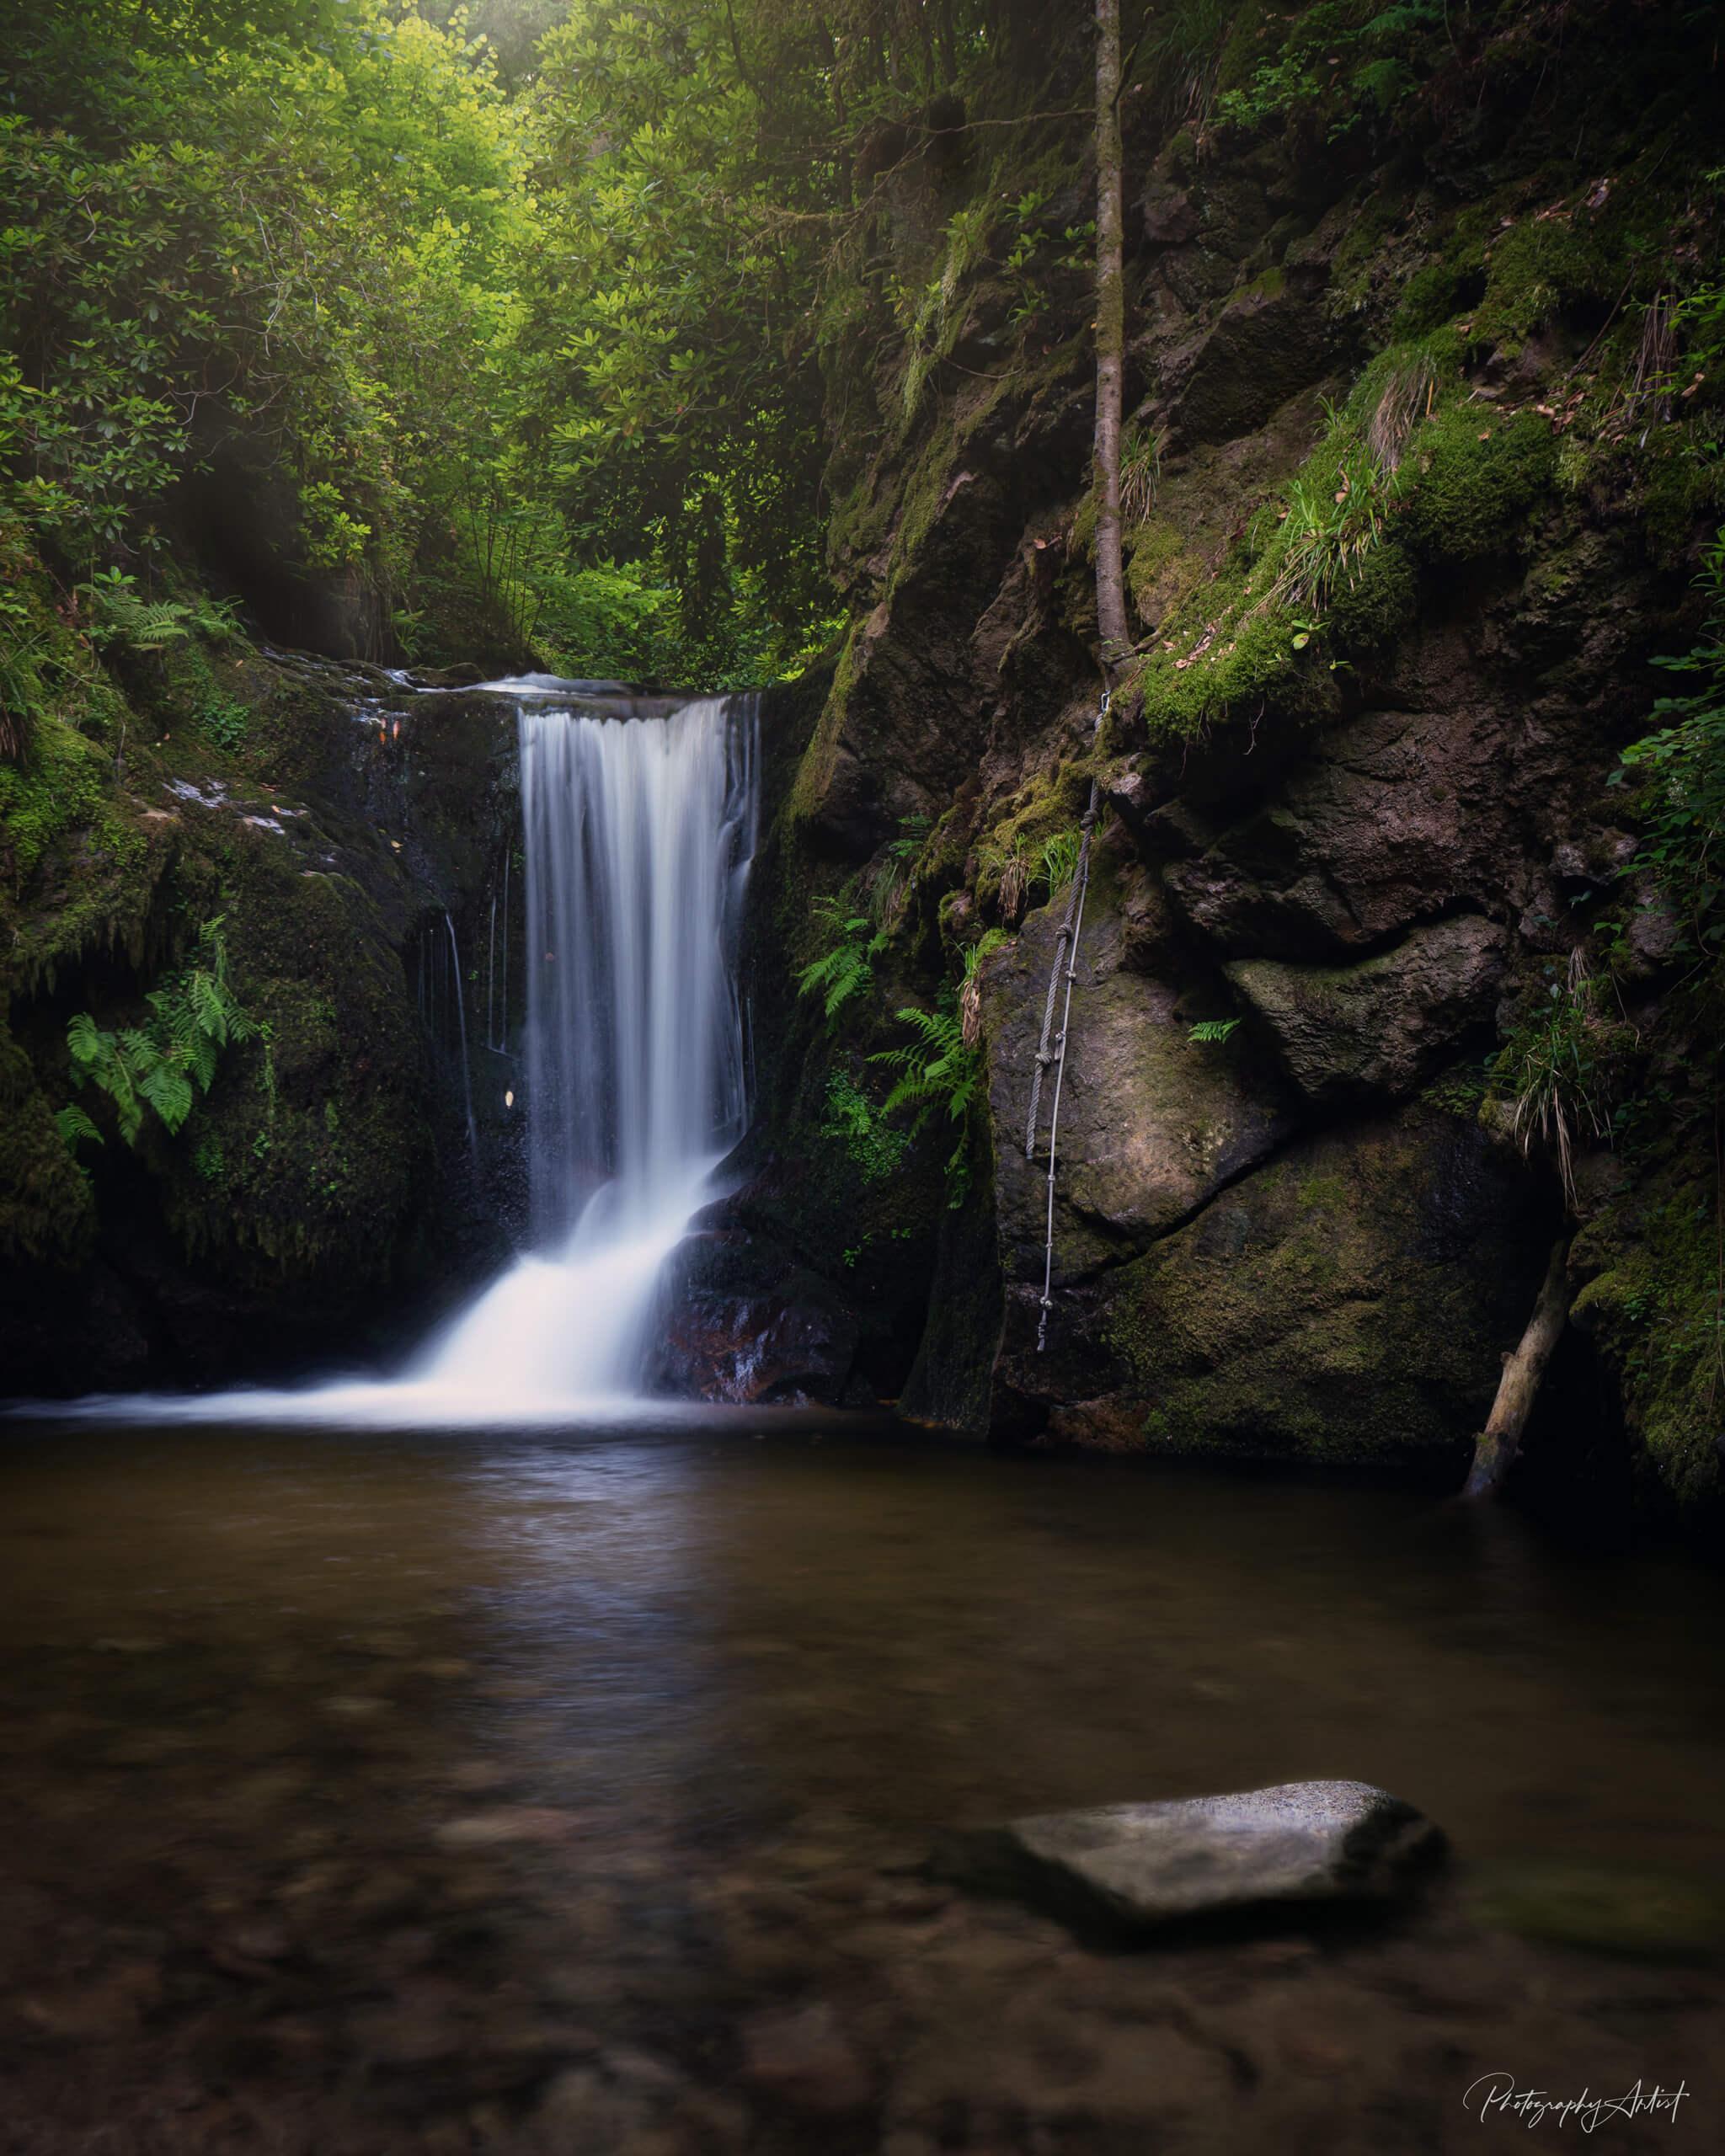 Geroldsauer Wasserfall 2